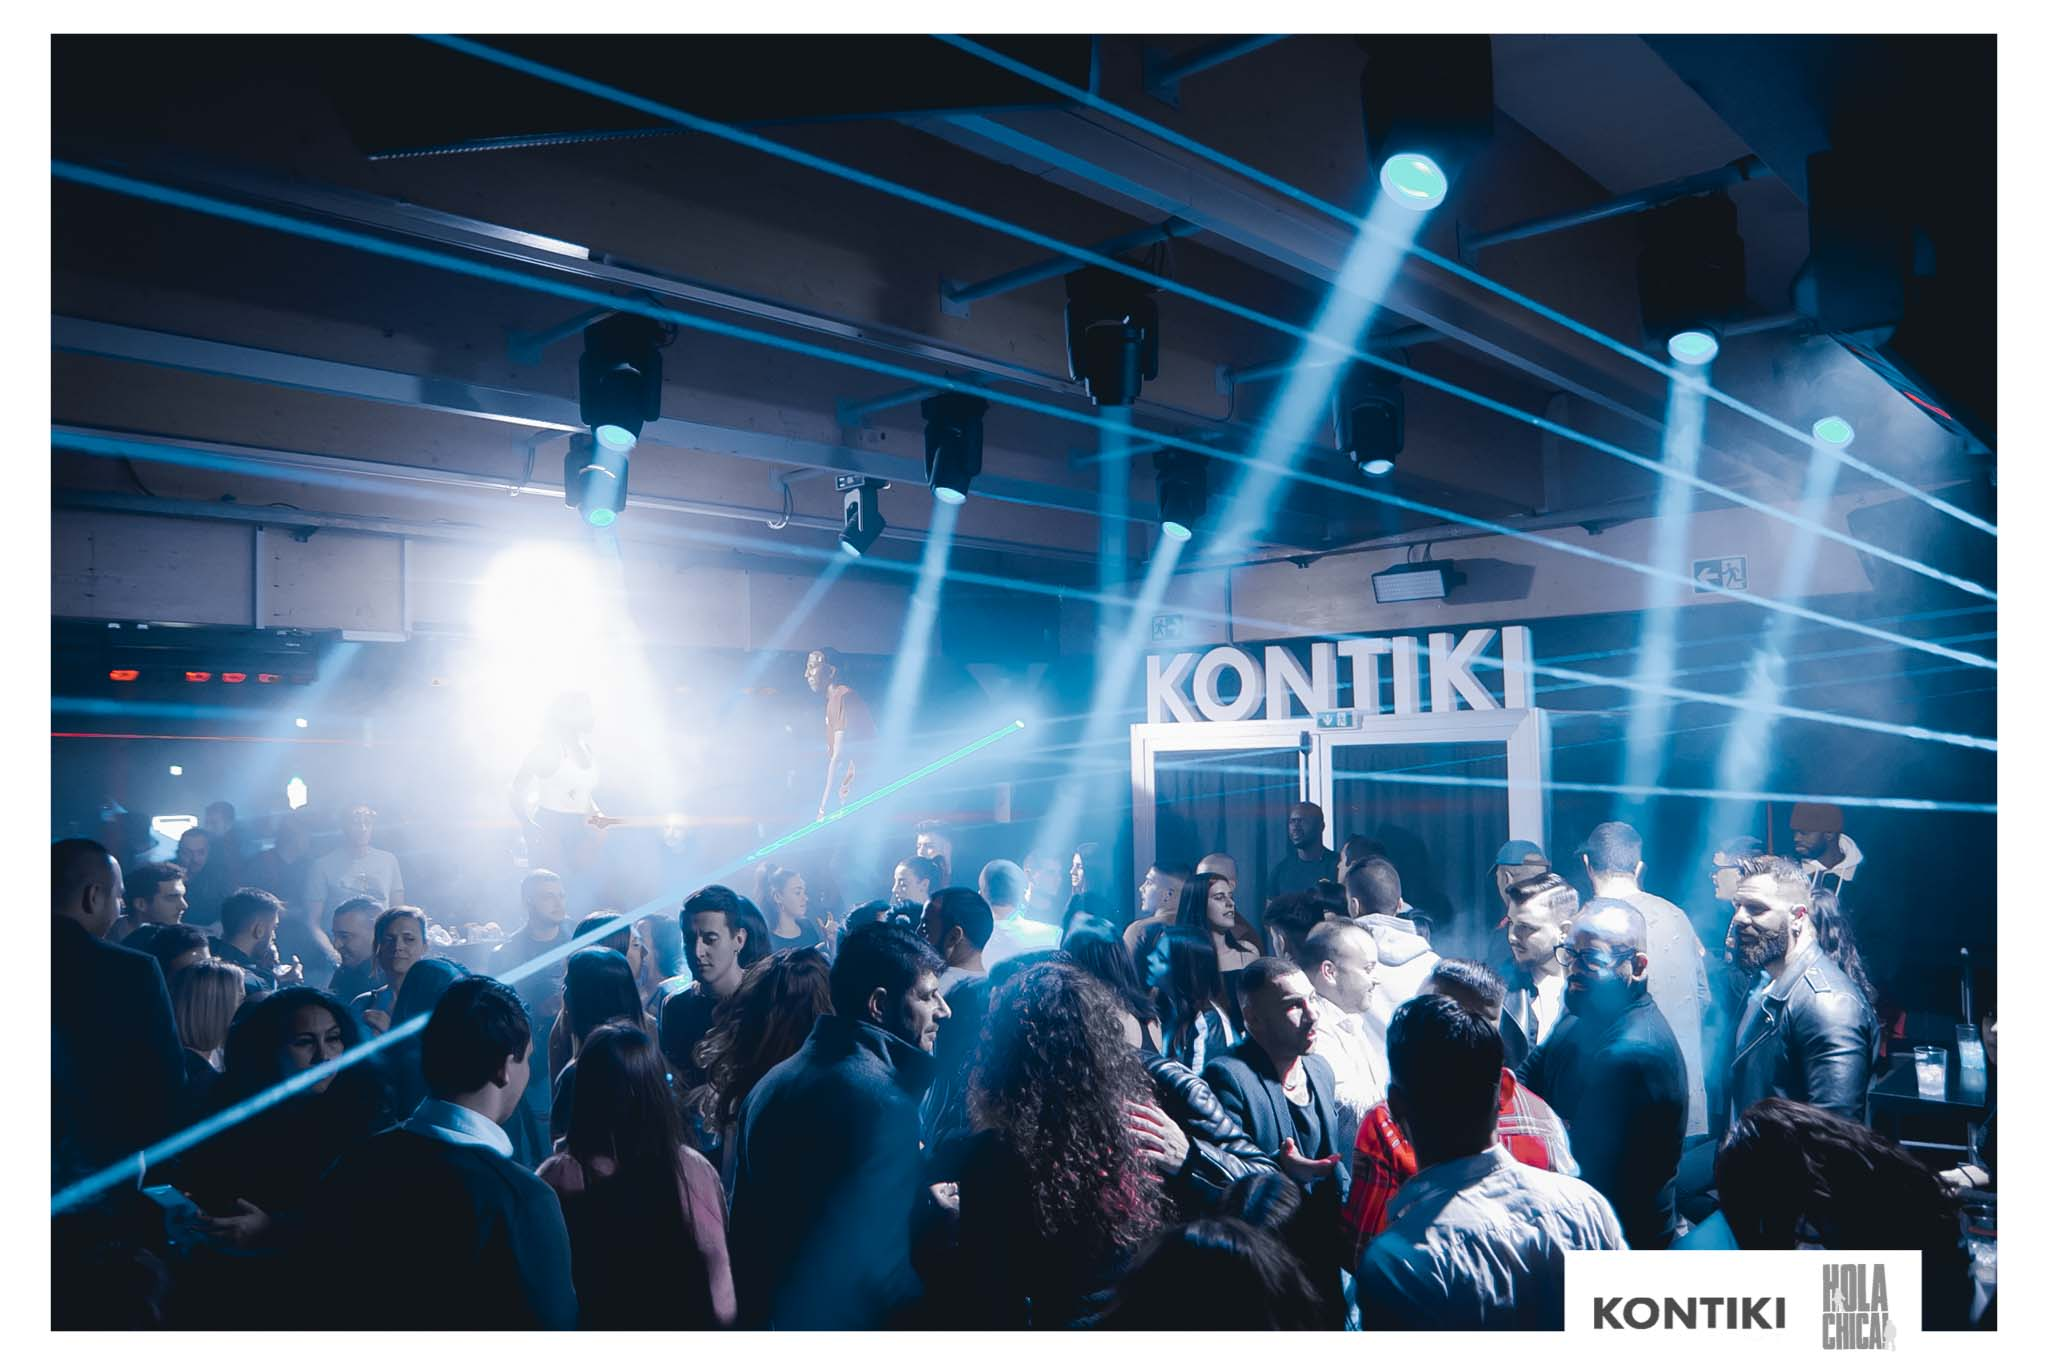 Kontiki Club primo Hola Chica di febbraio 2020